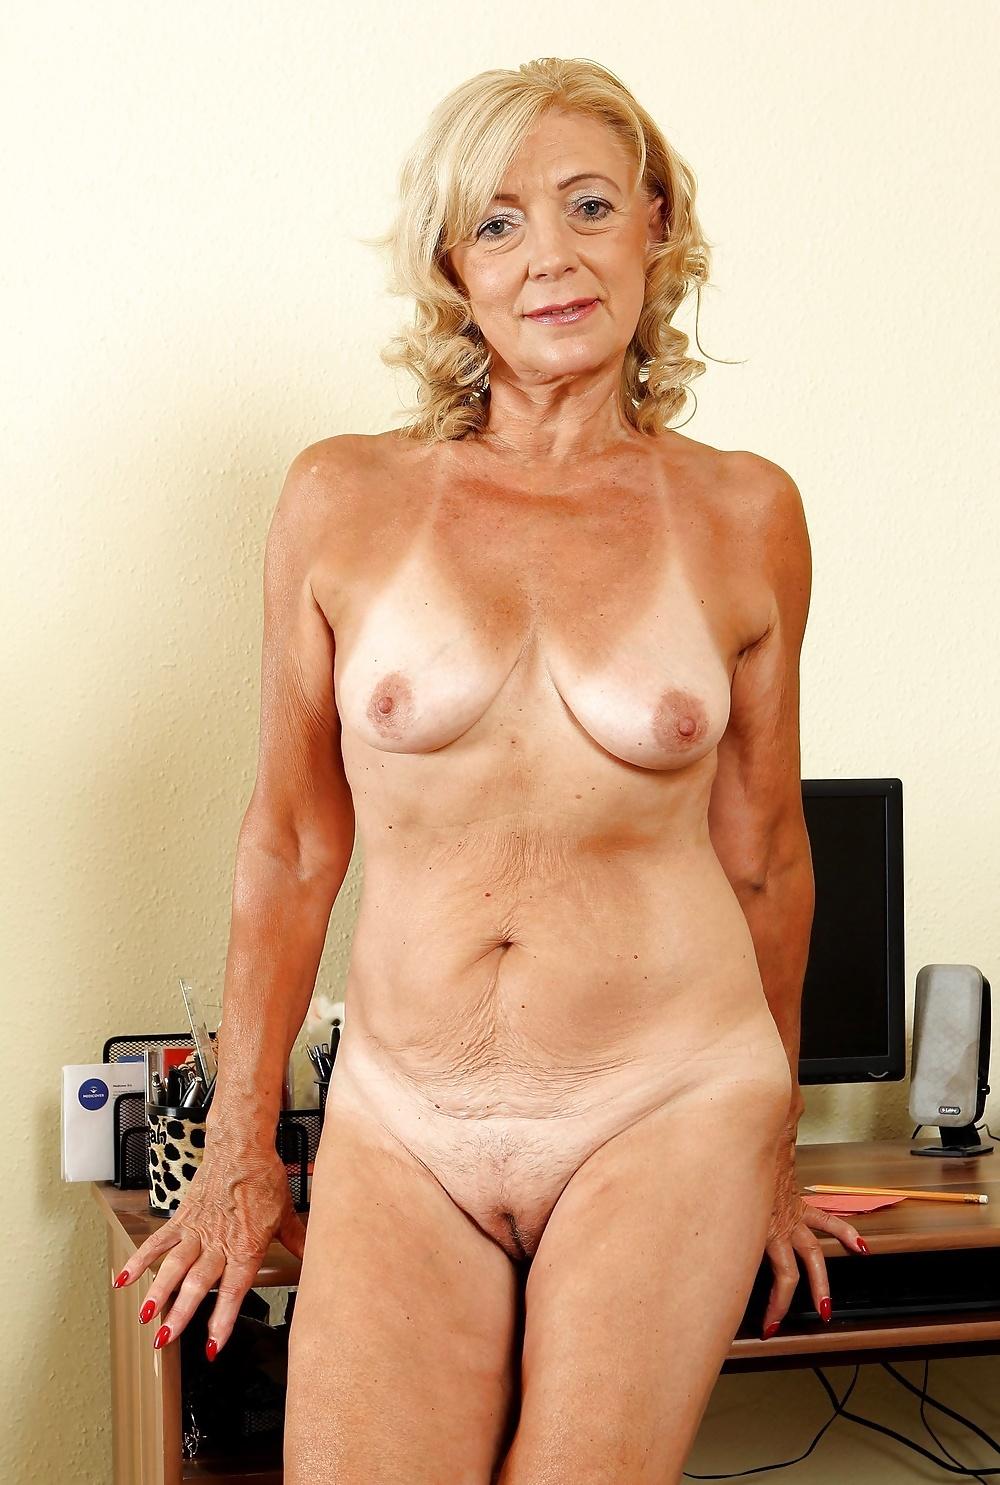 fuckable-older-women-fuck-under-litle-girls-porn